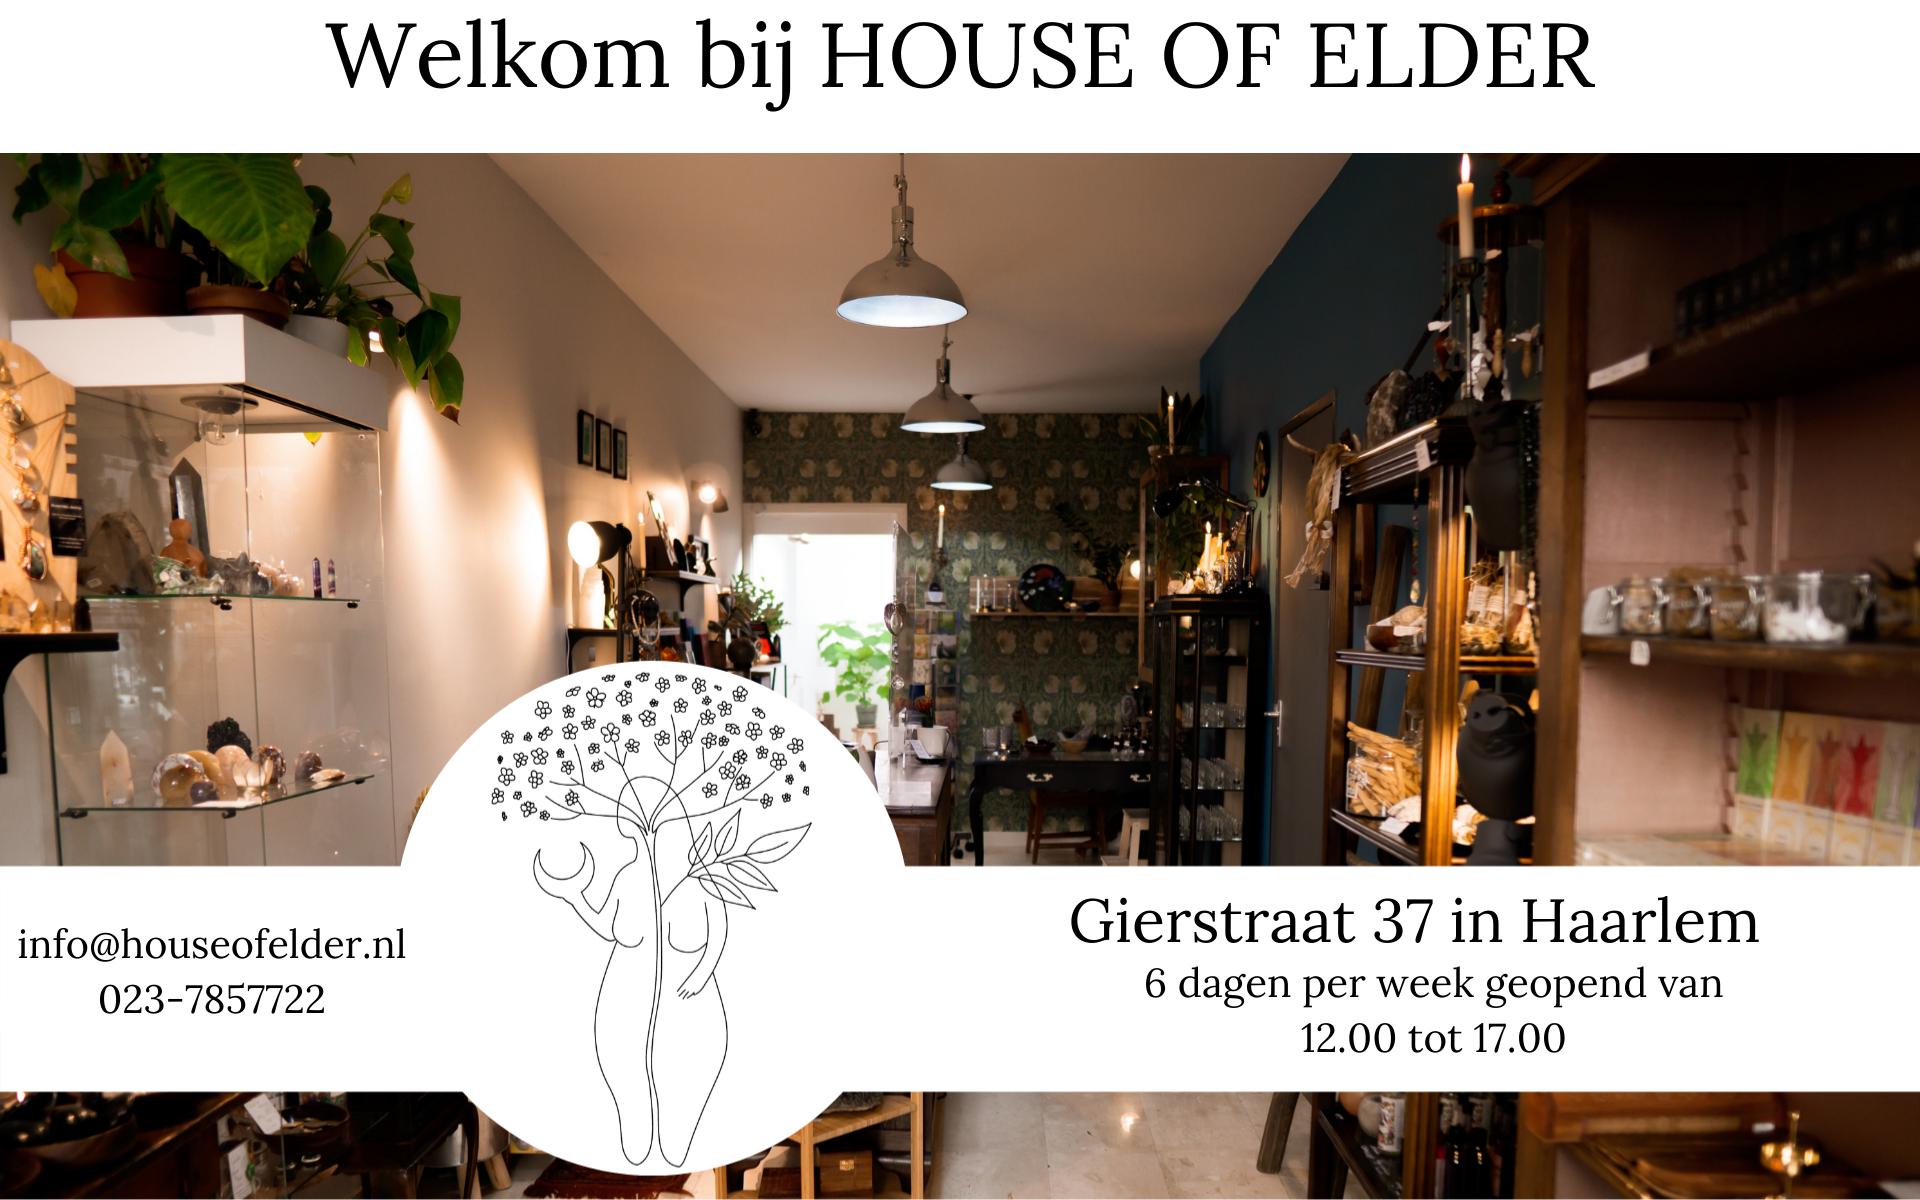 House of Elder welkom